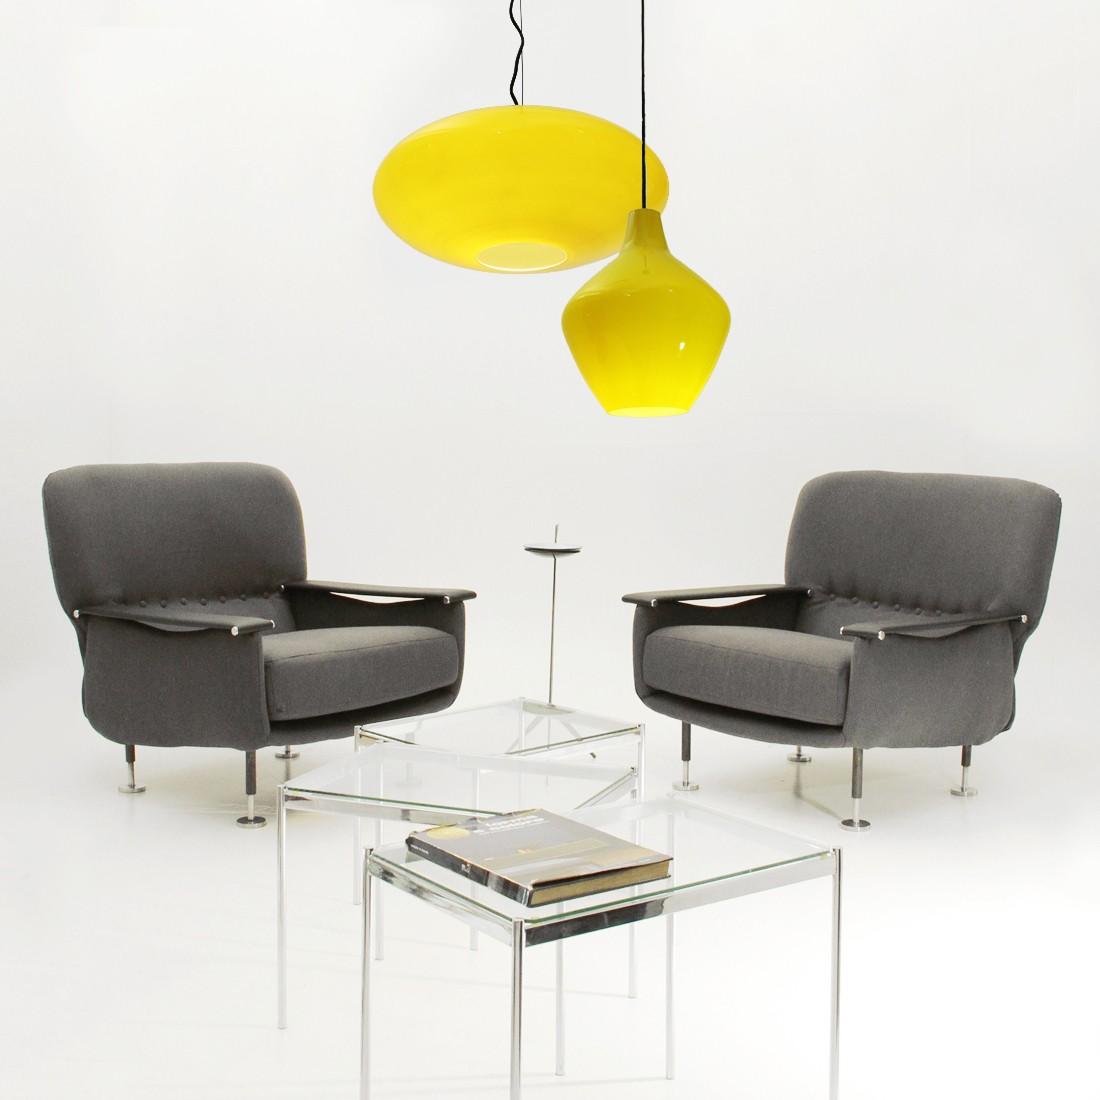 yellow pendant lighting. Vintage Italian Yellow Pendant Lamp In Glass - 1960s. Previous Next Lighting